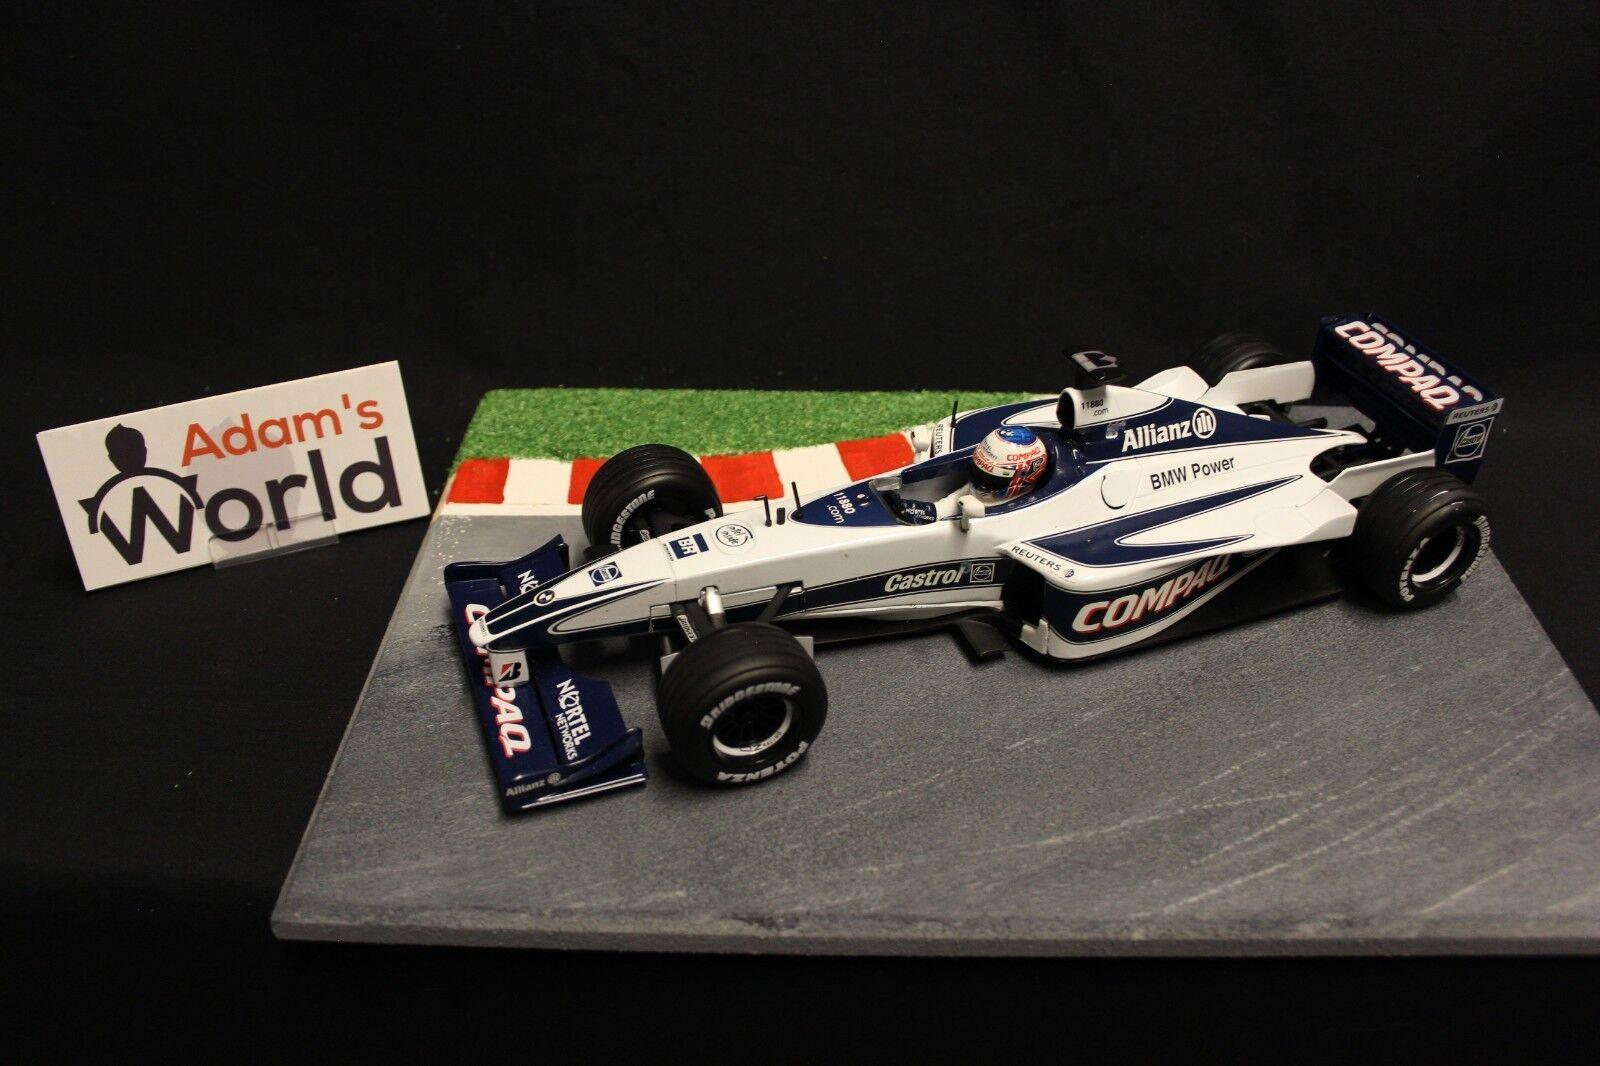 Hot Wheels Williams BMW FW22 2000 1 18  10 Jenson Button (GBR) (F1NB)